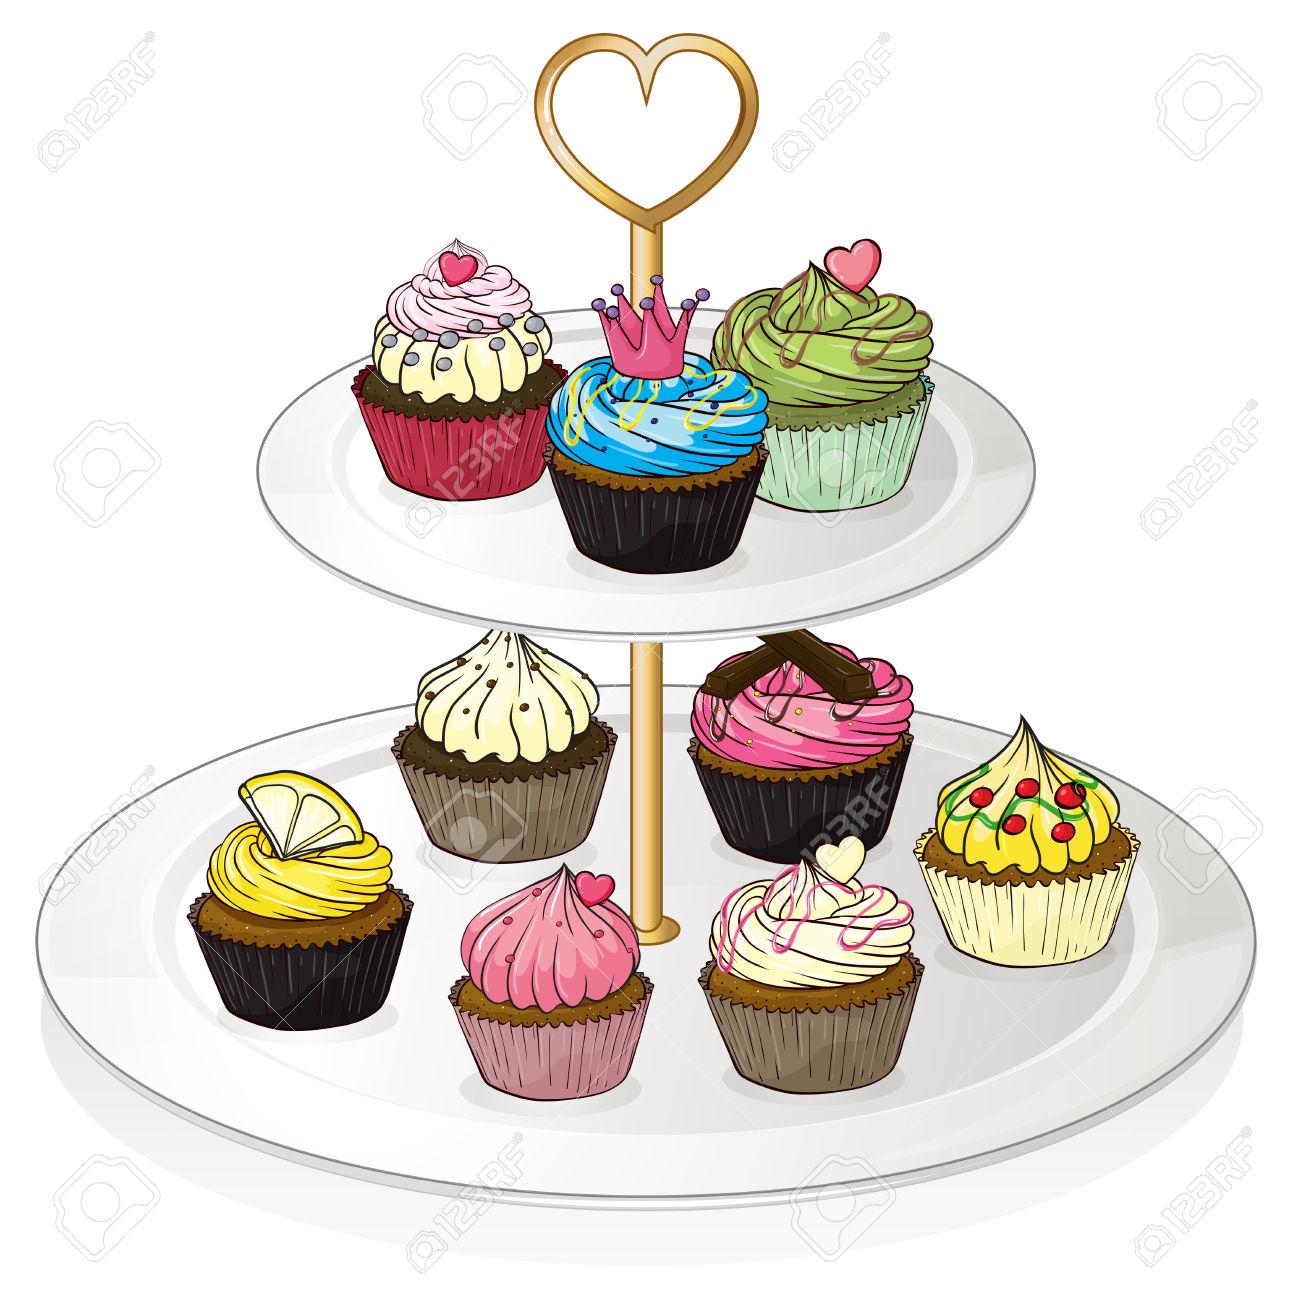 1293x1300 Dessert Clipart Dessert Tray